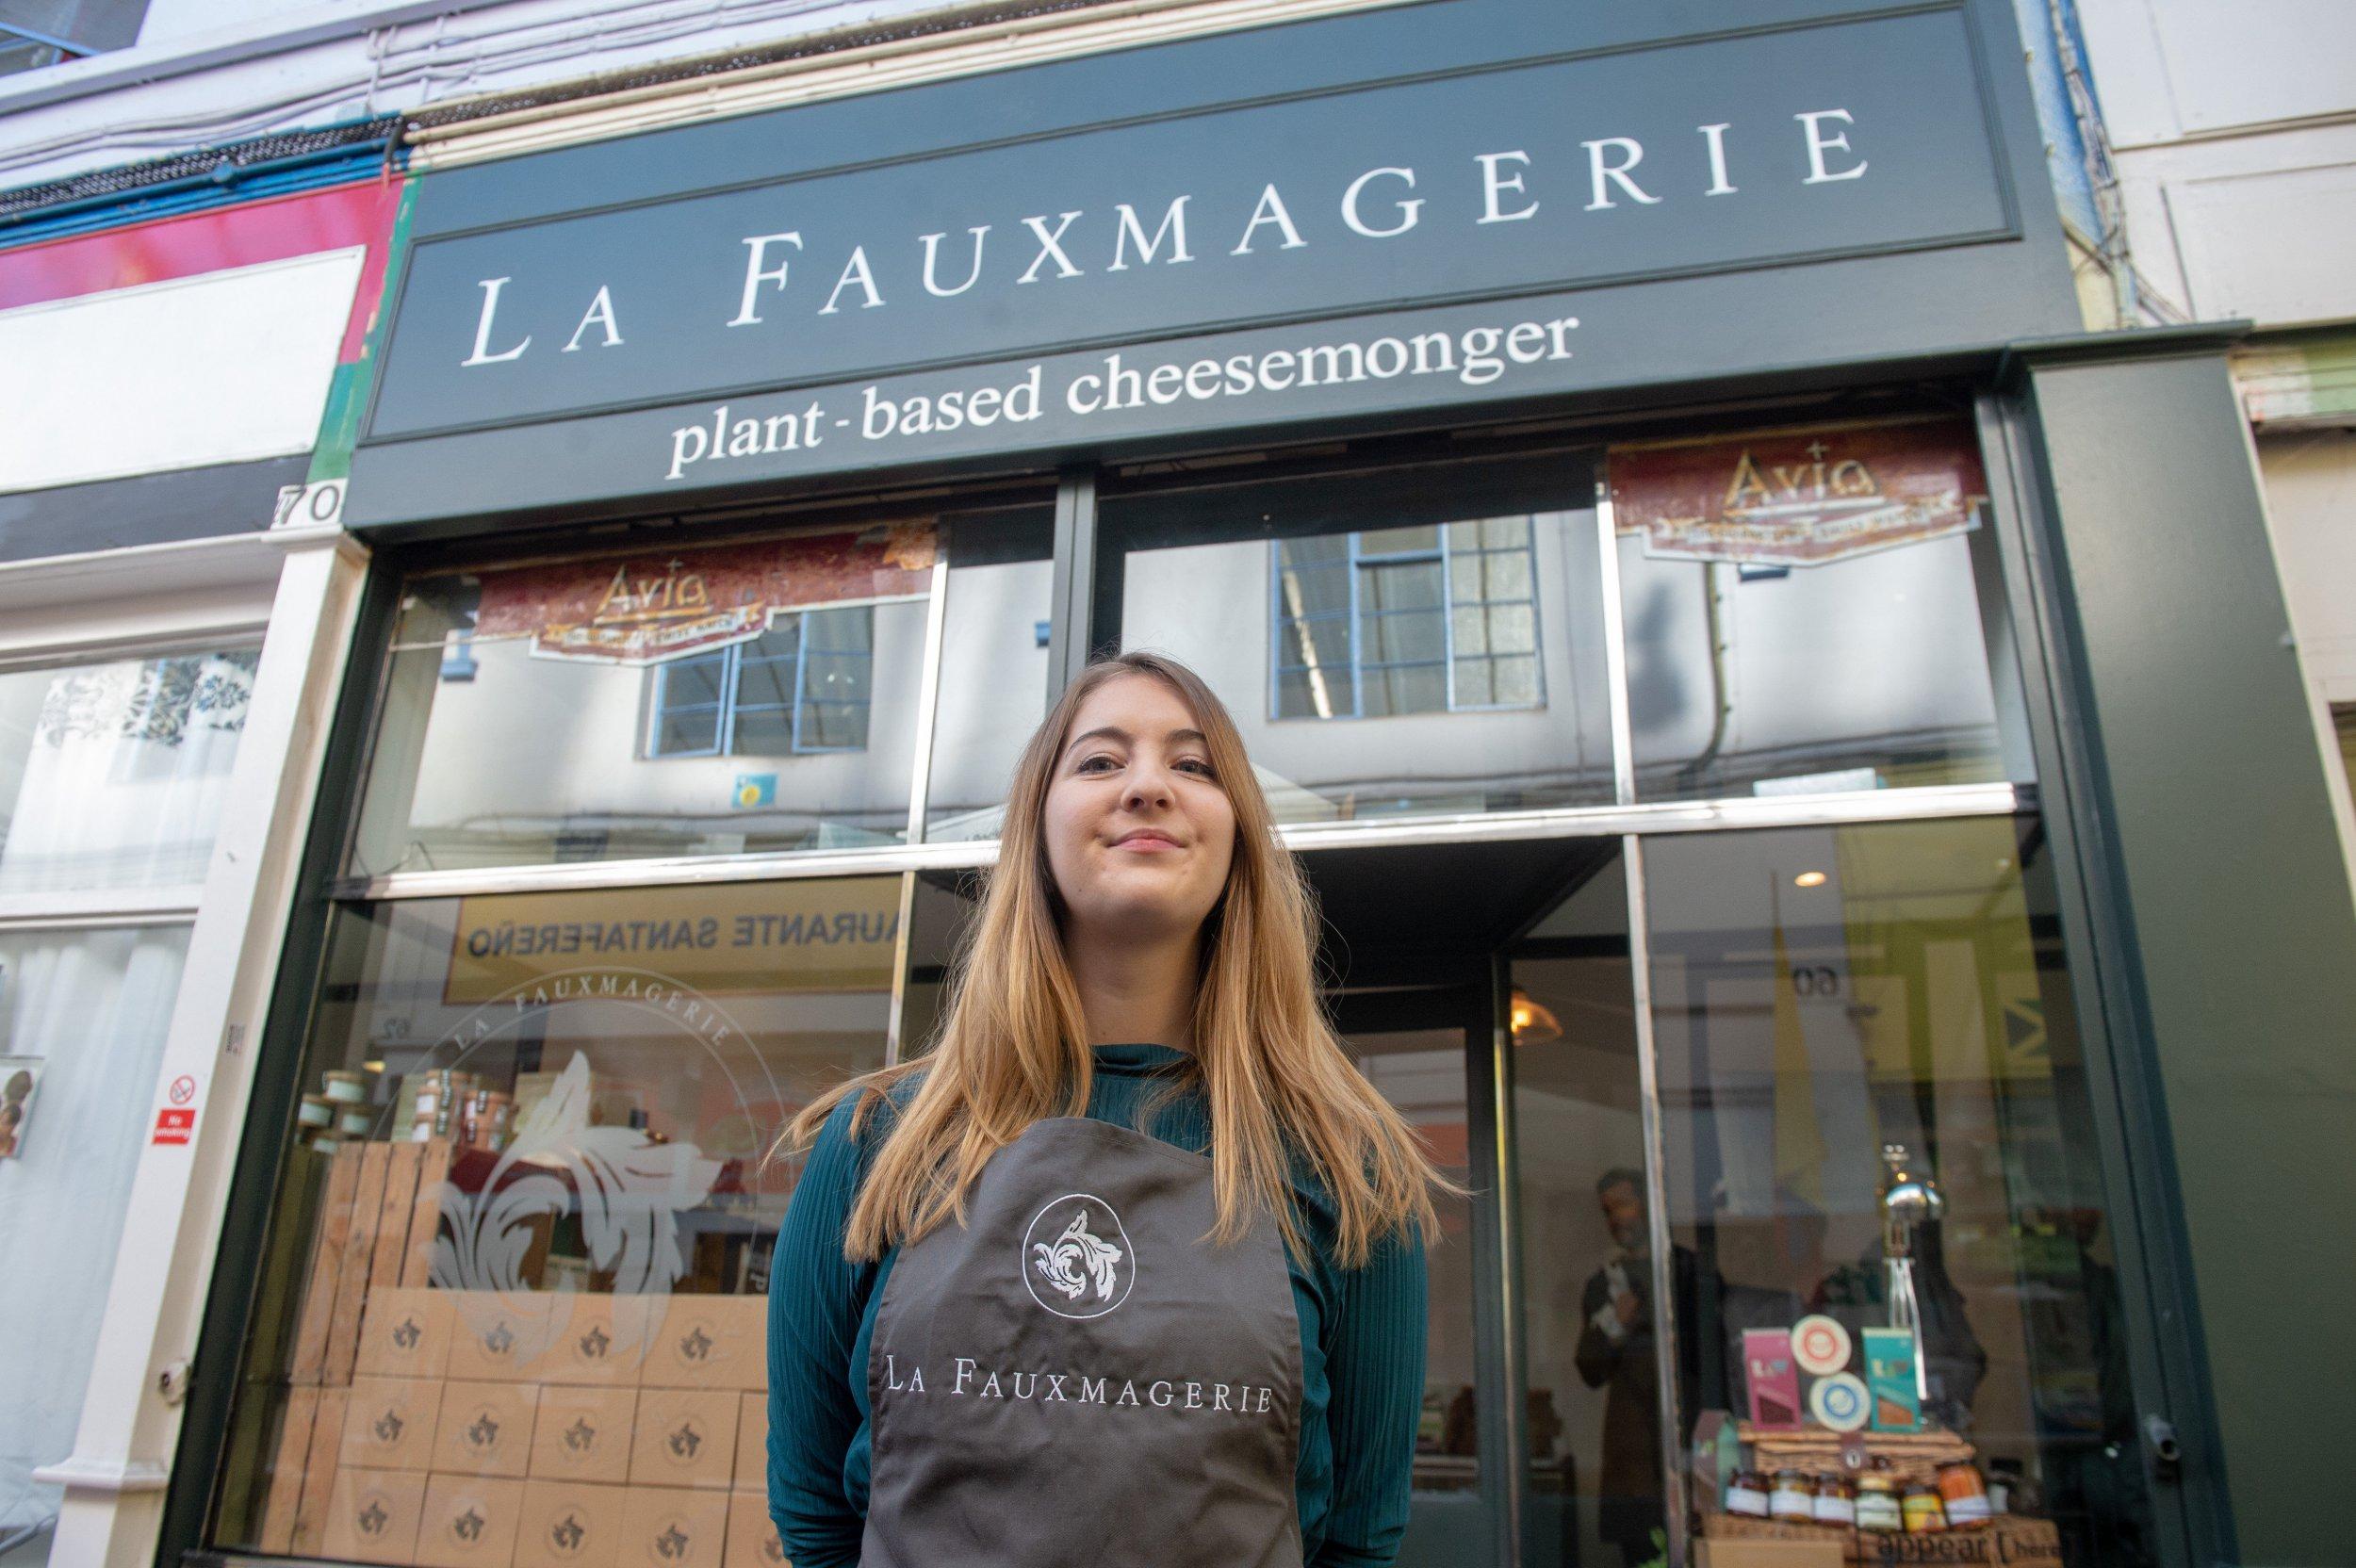 Vegan cheesemonger La Fauxmagerie opens in London